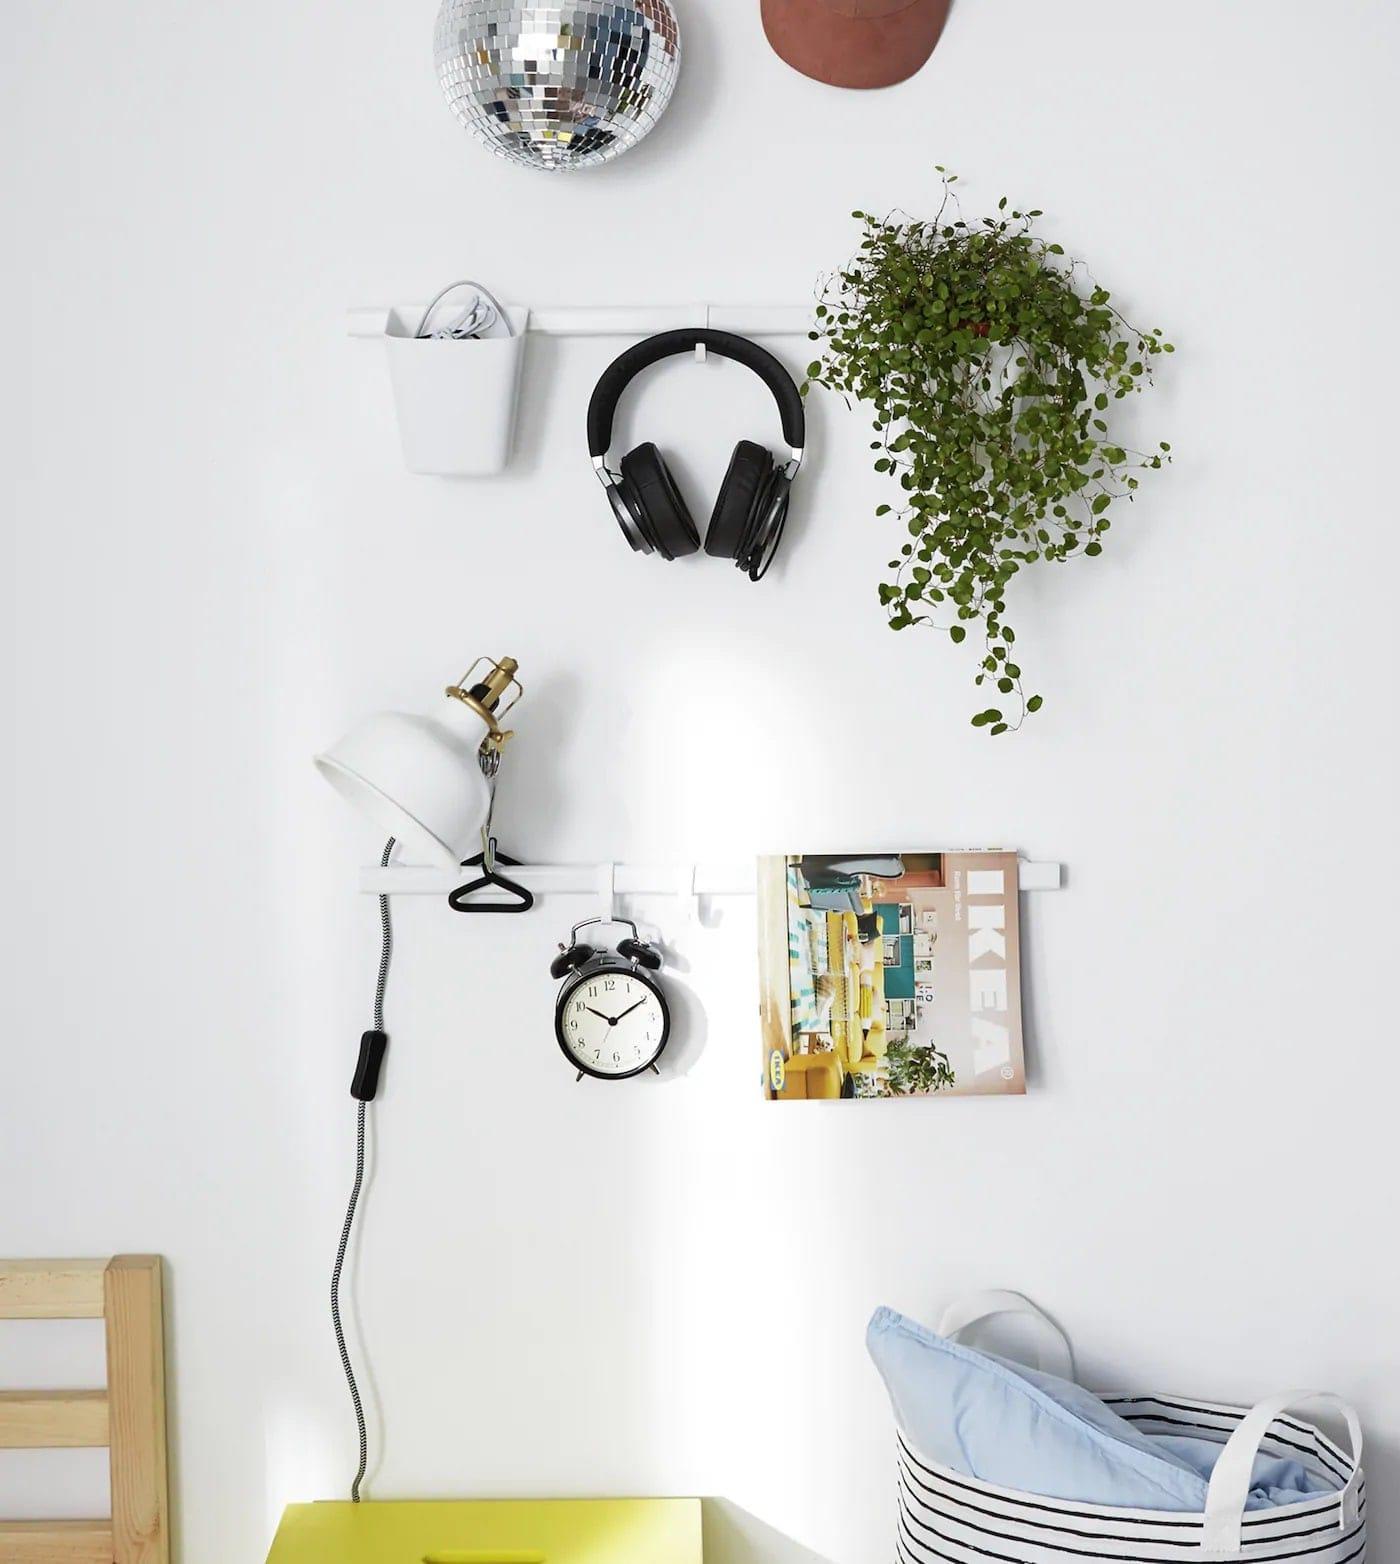 ikea duvar aksesuarlari ile dekorasyon fikirleri (36)-min-min